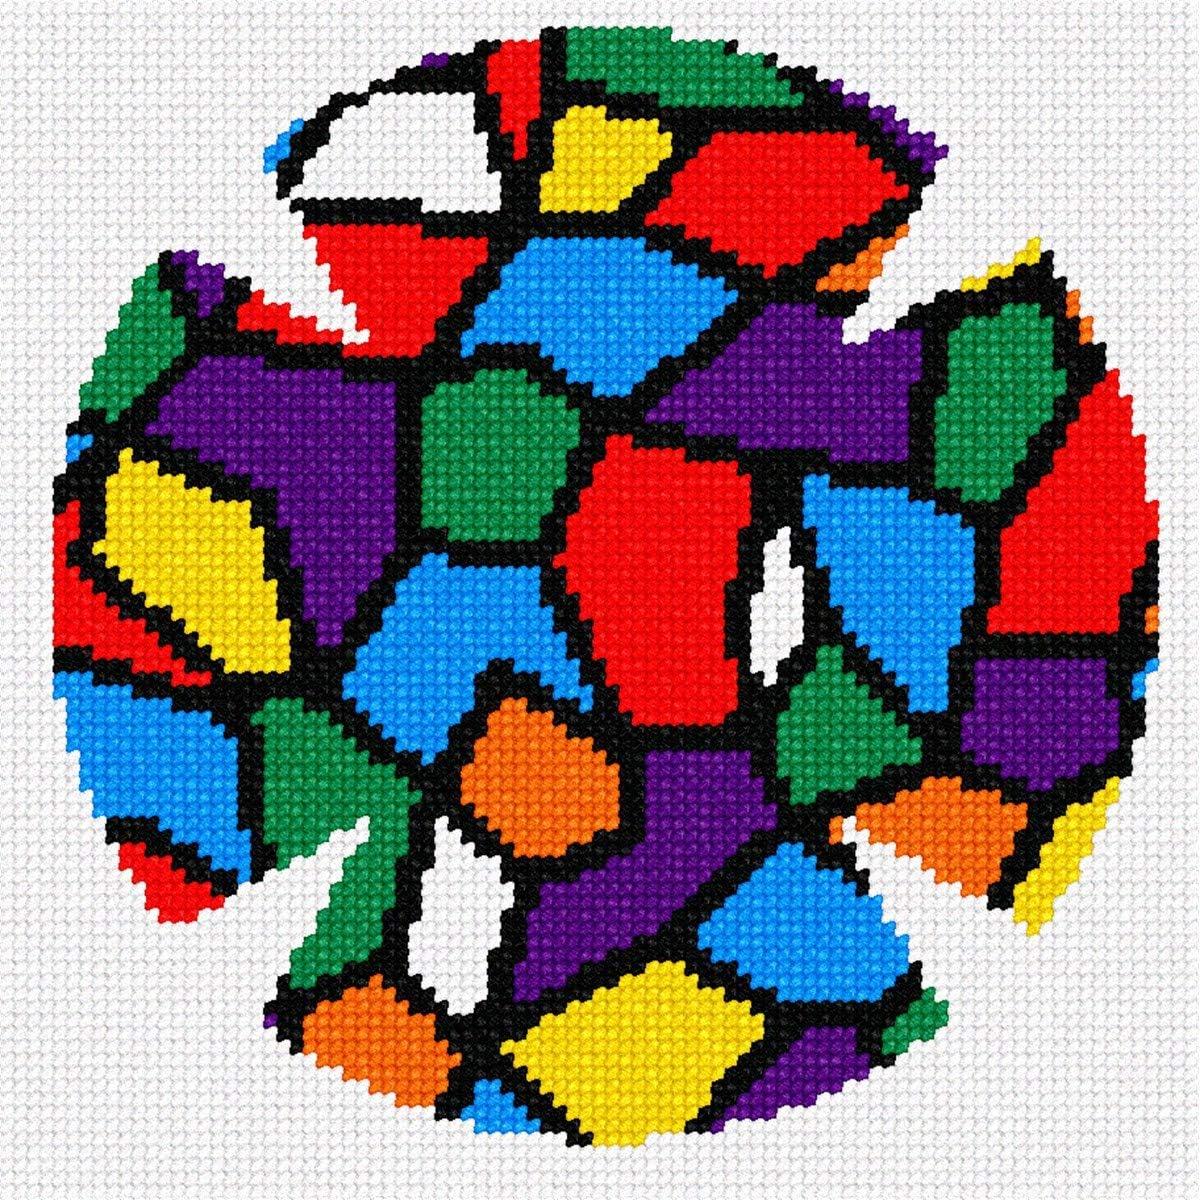 Needlepoint Kit pepita Yarmulka Stained Glass Colors Large